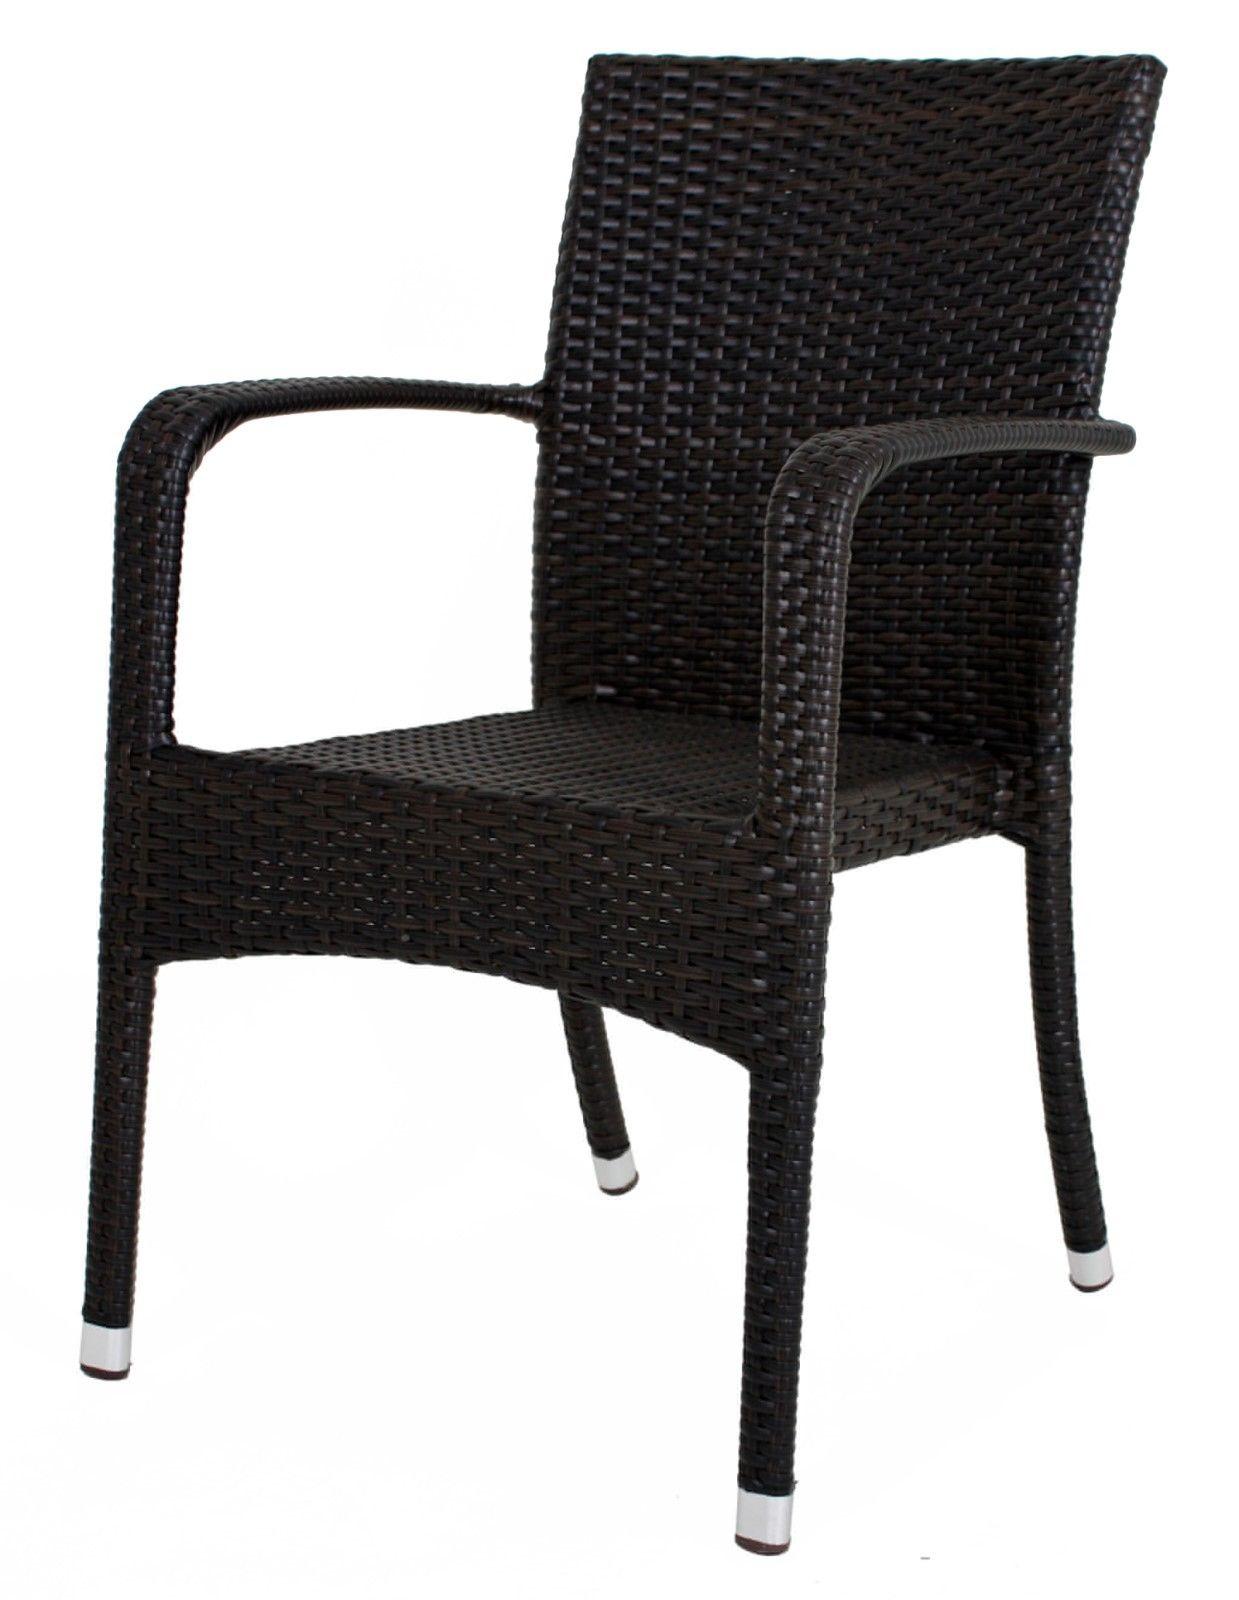 Stapelstuhl London Garten Stuhl Stühle Gartenmöbel Gartenstühle ...